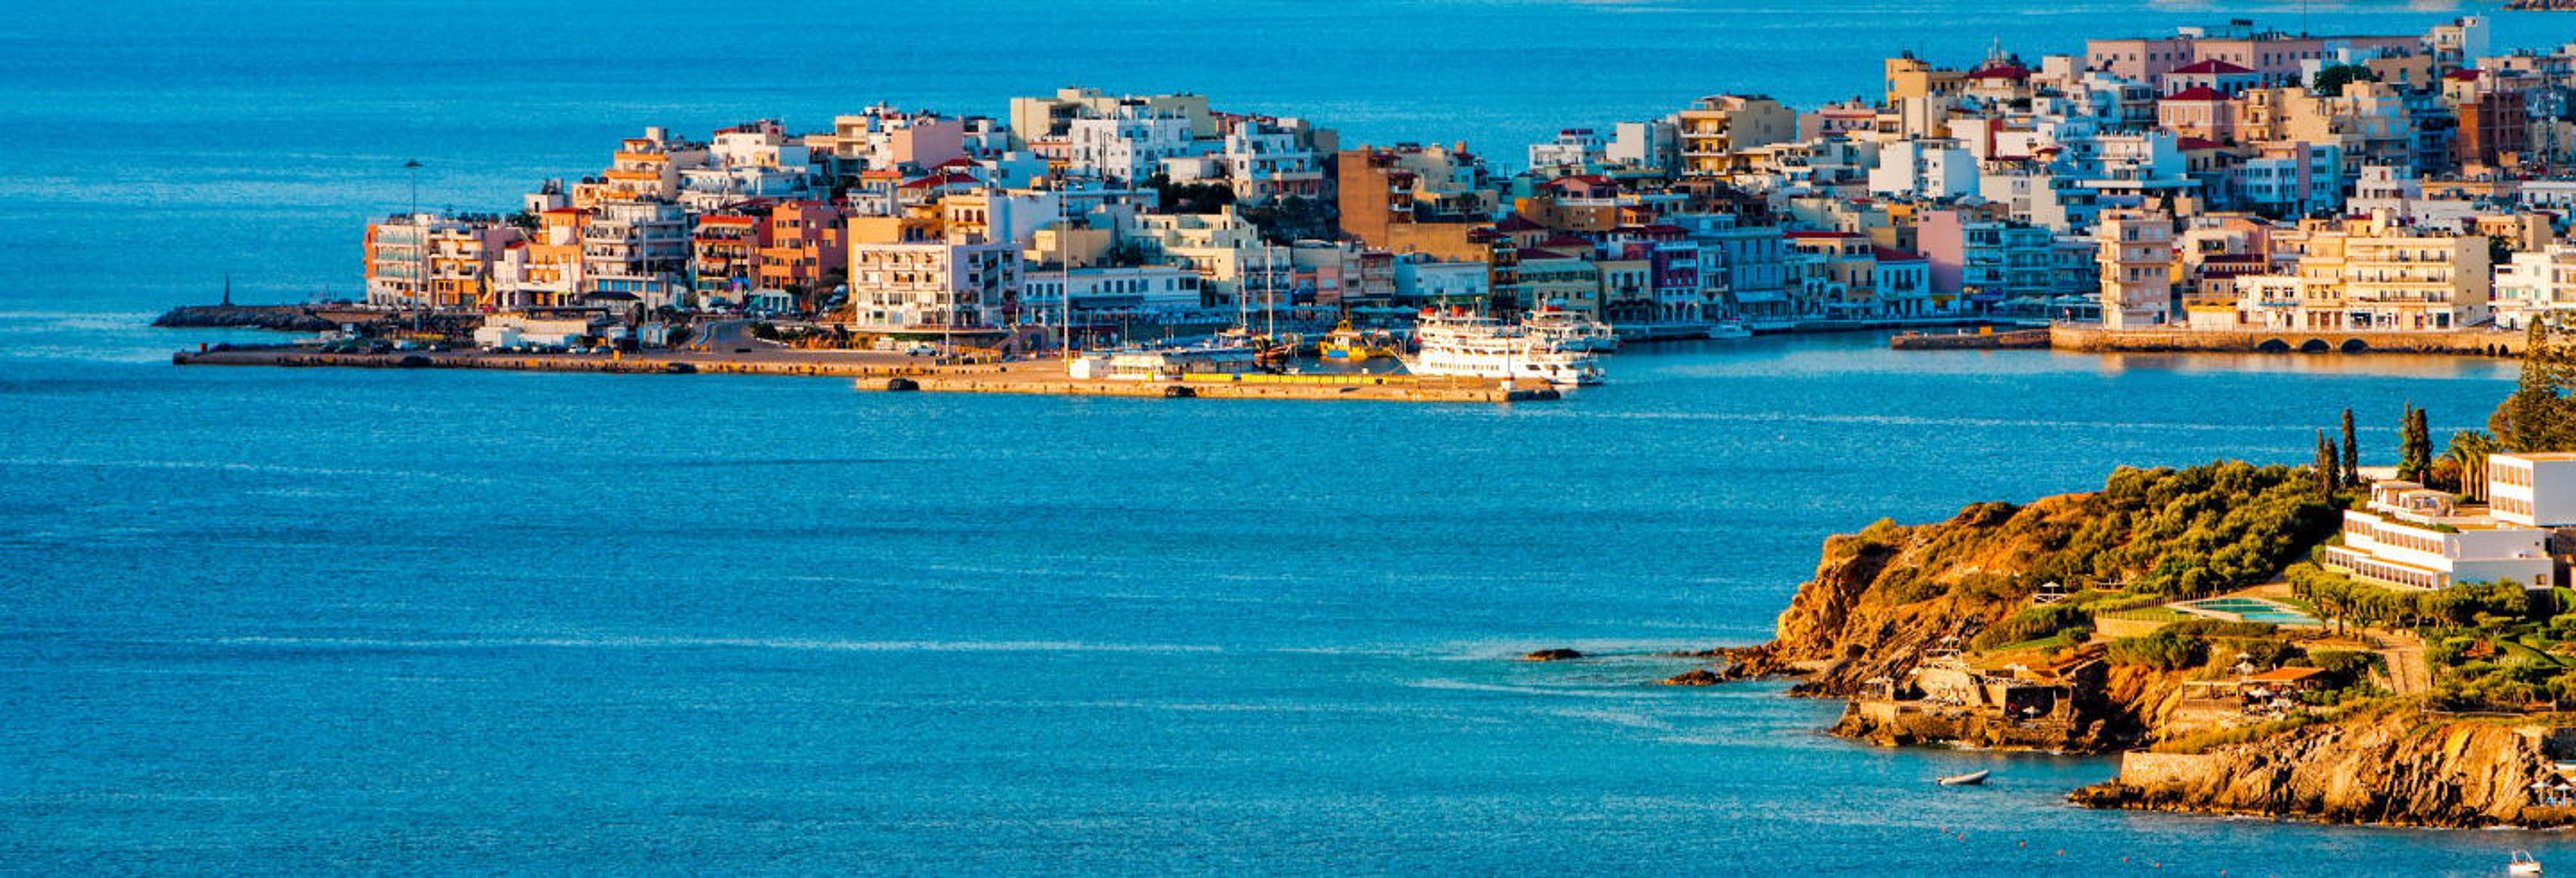 Excursion à Ágios Nikólaos, Elounda et Spinalonga